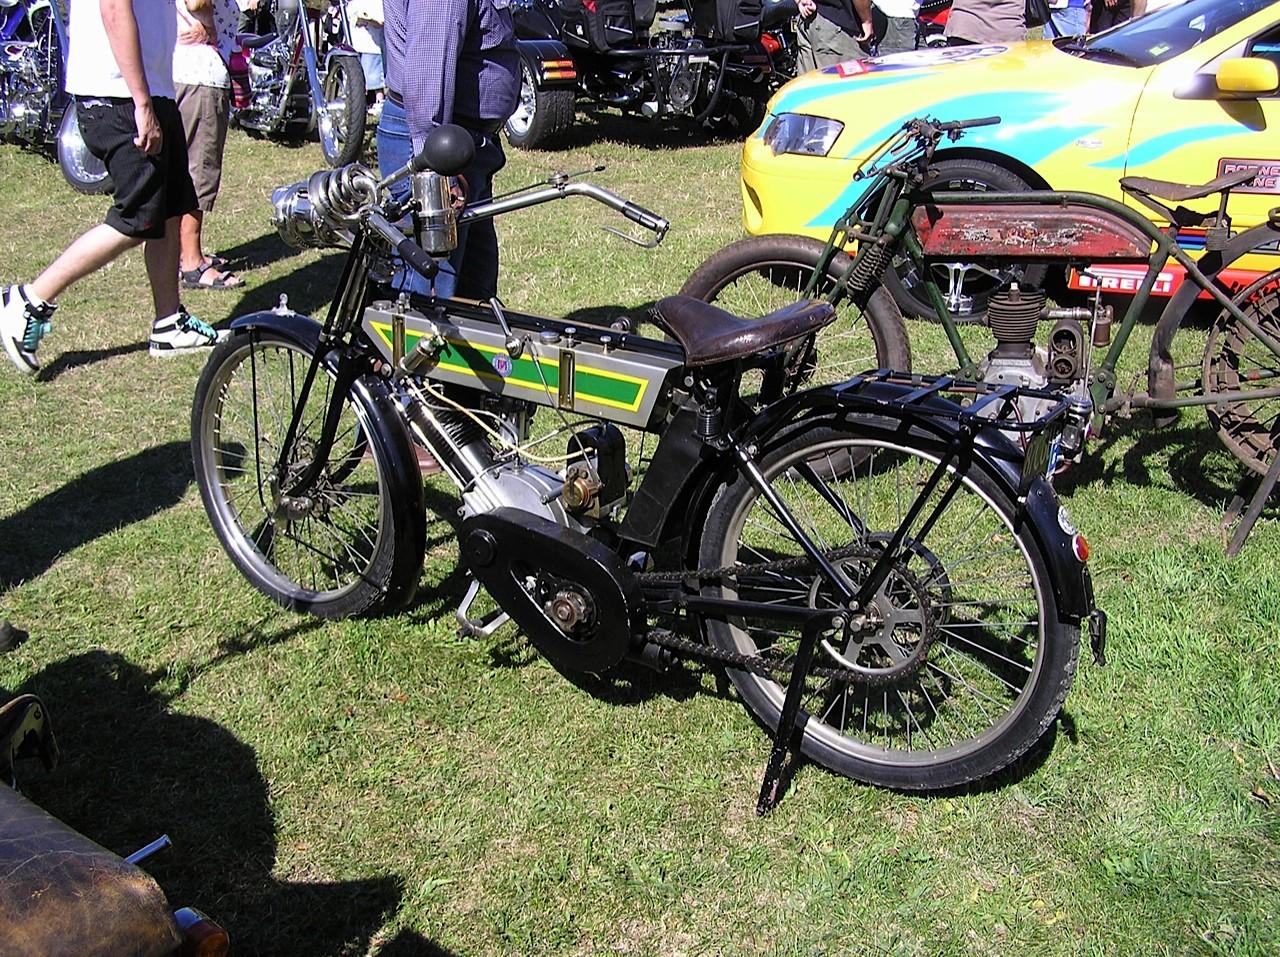 1912 Triumph 500cc